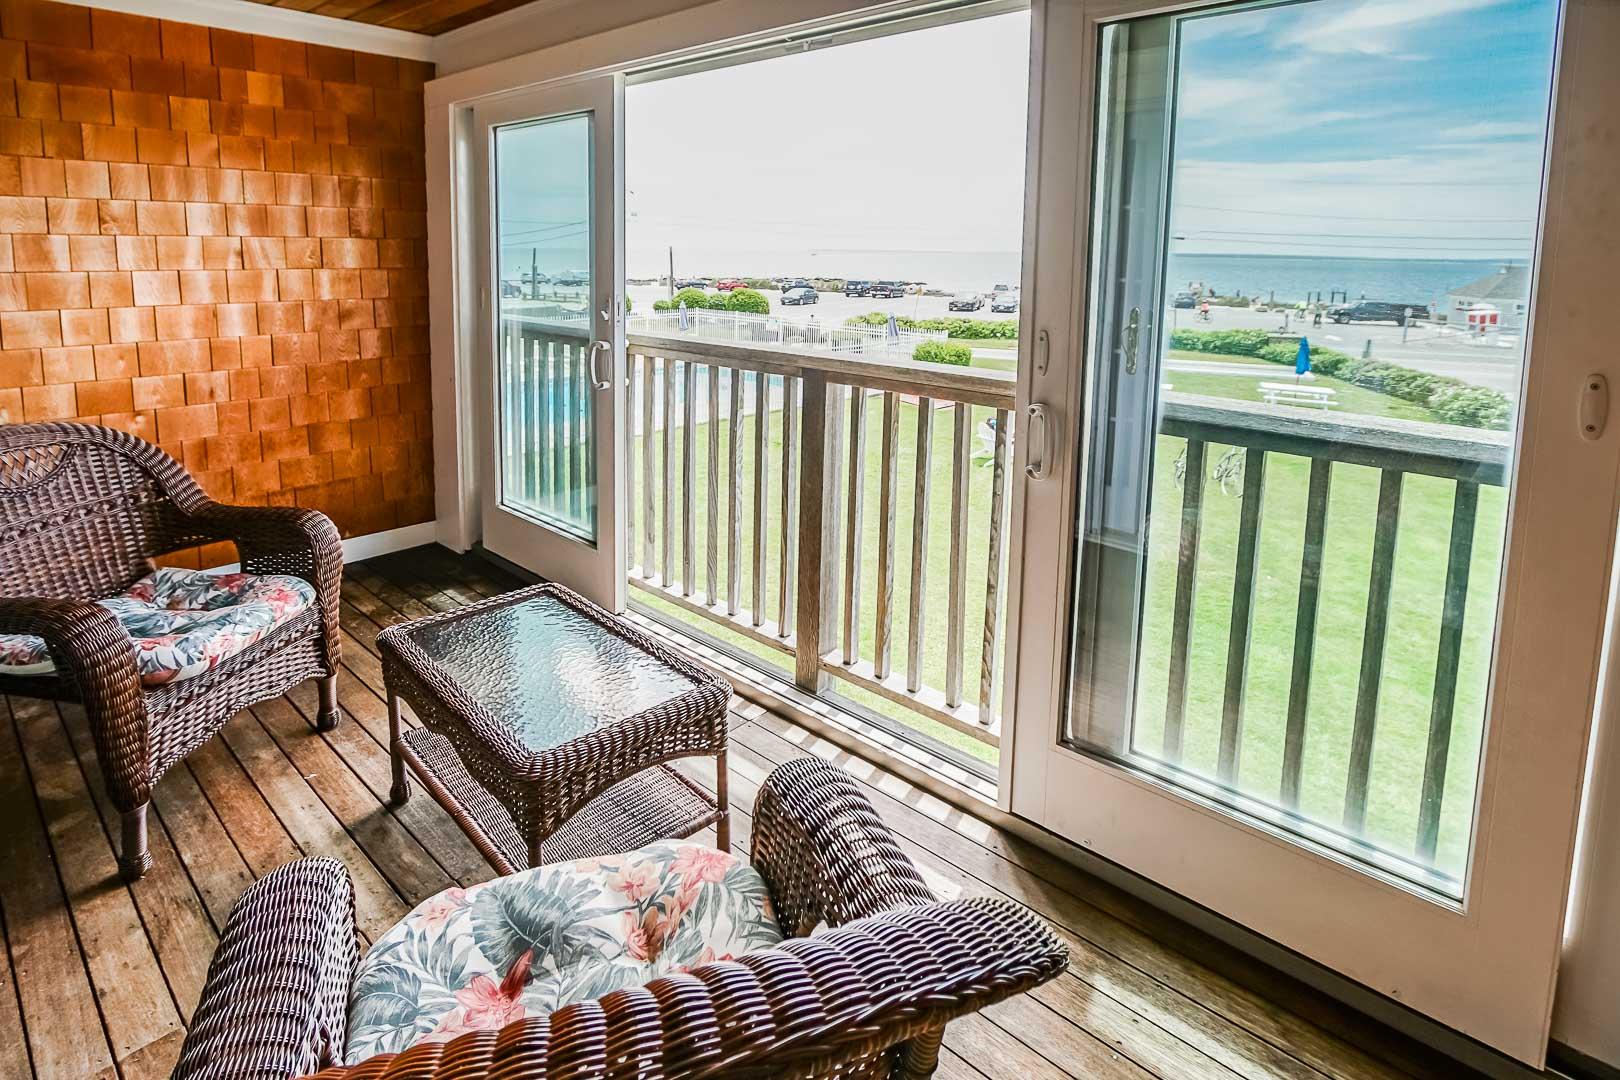 A scenic balcony view from VRI's Beachside Village Resort in Massachusetts.